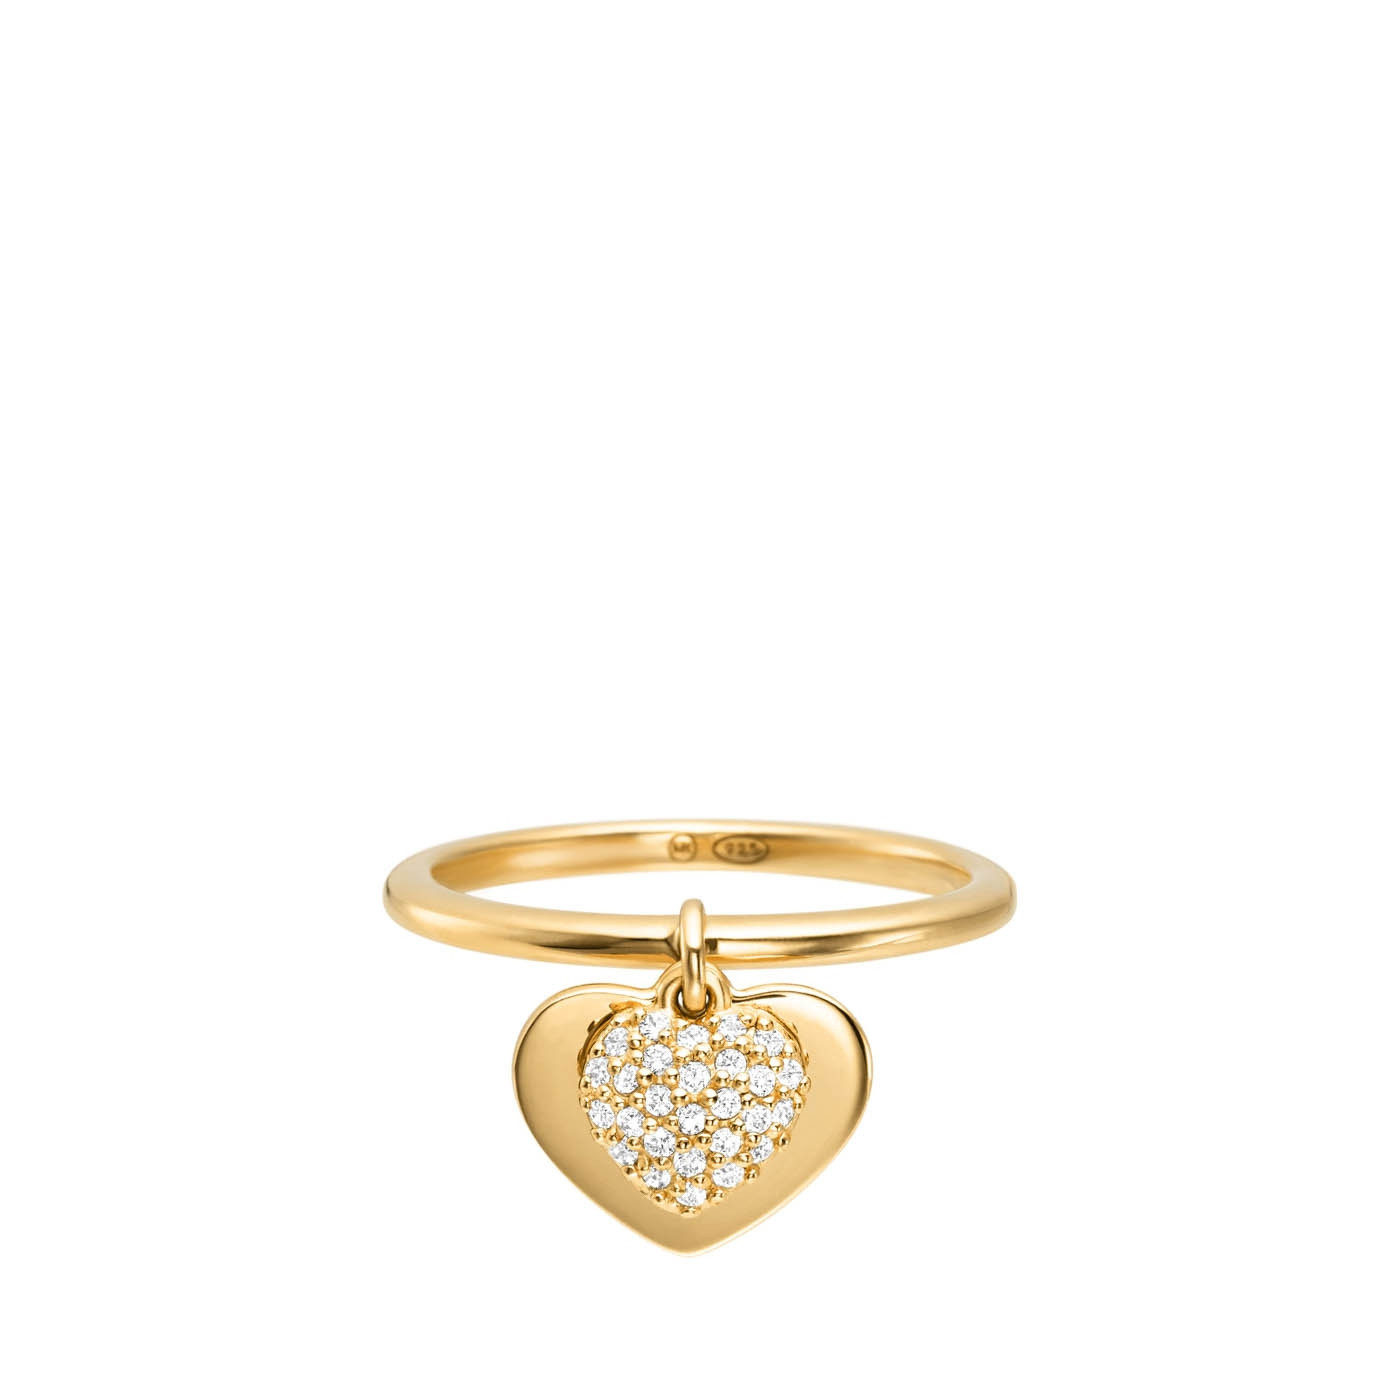 Michael Kors Zilveren Goudkleurige Love Ring MKC1121AN710